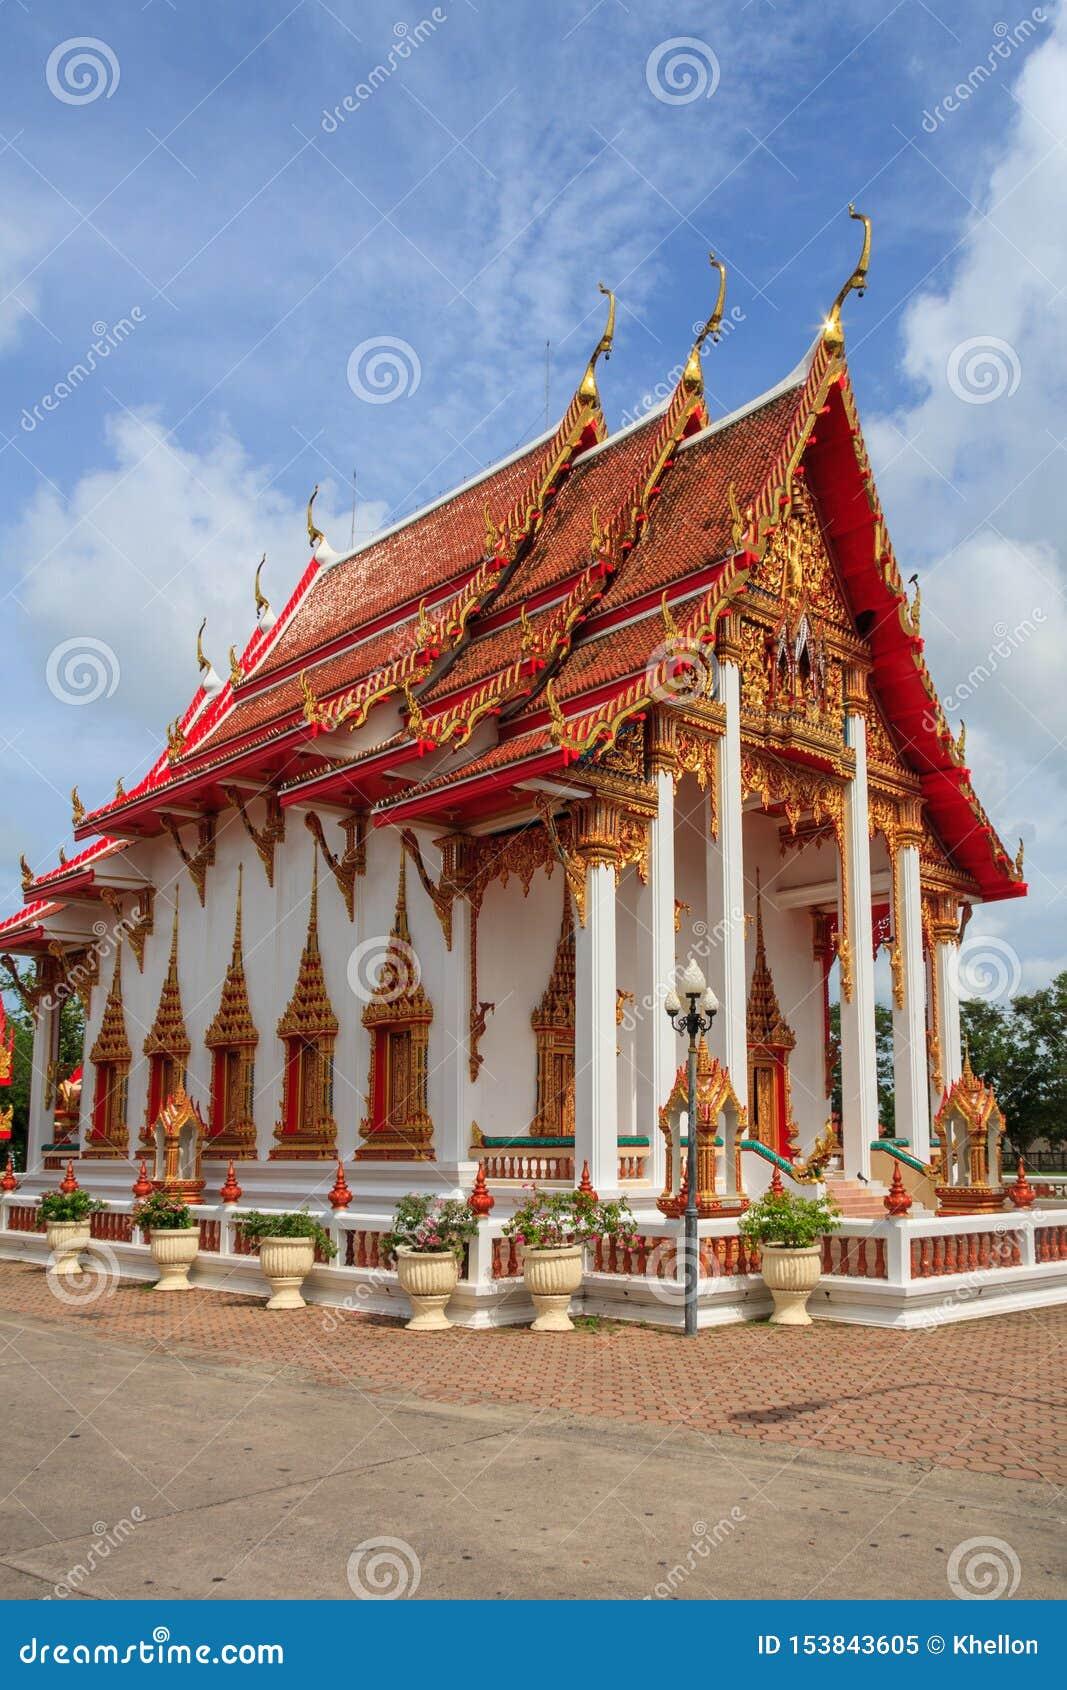 Chalongtempel, Phuket, Thailand, wat